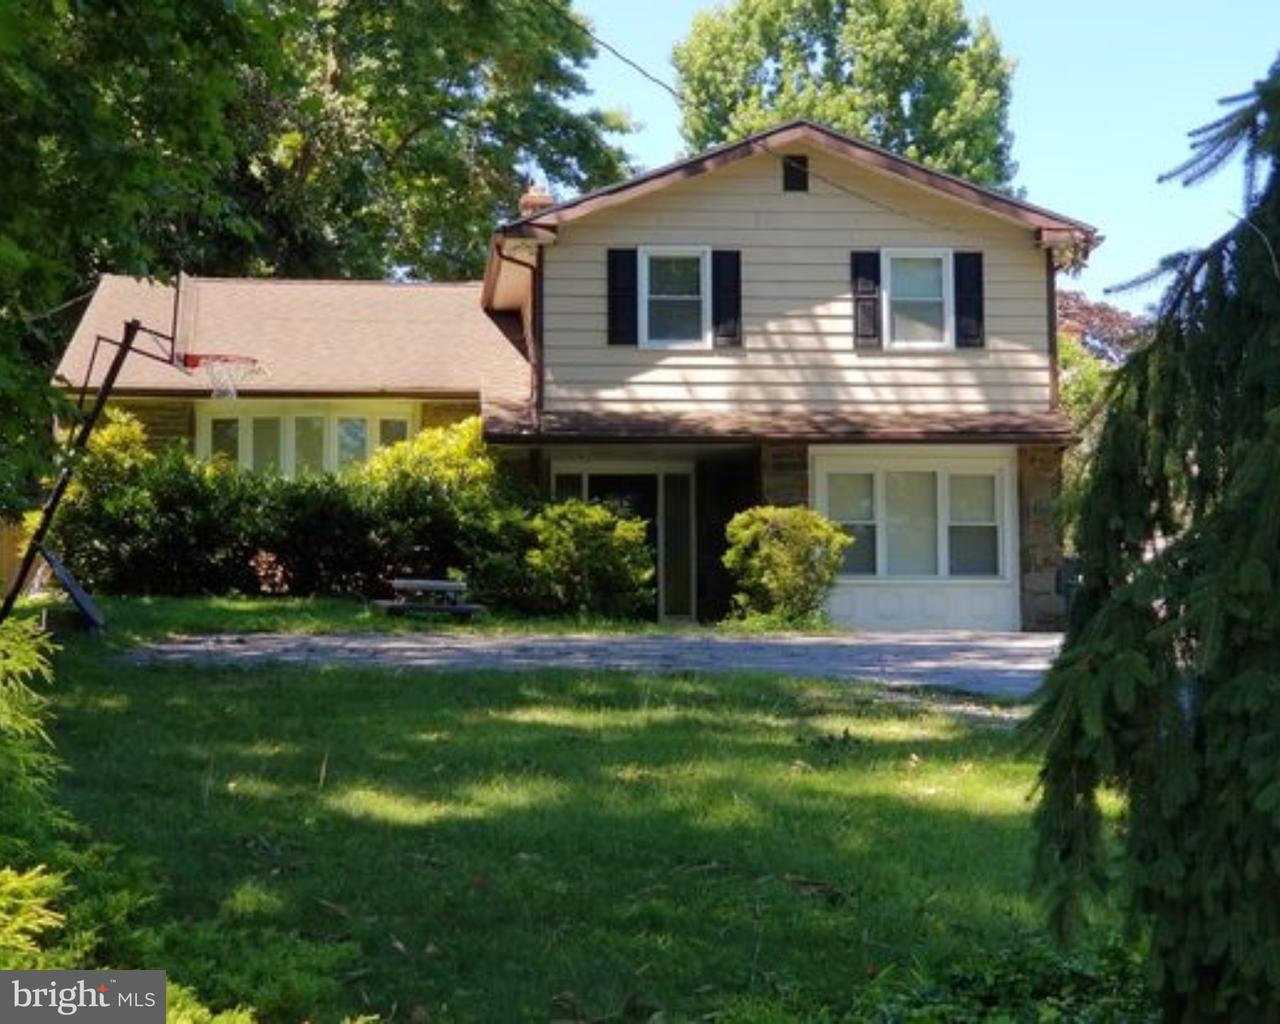 300 Bala Avenue Bala Cynwyd, PA 19004